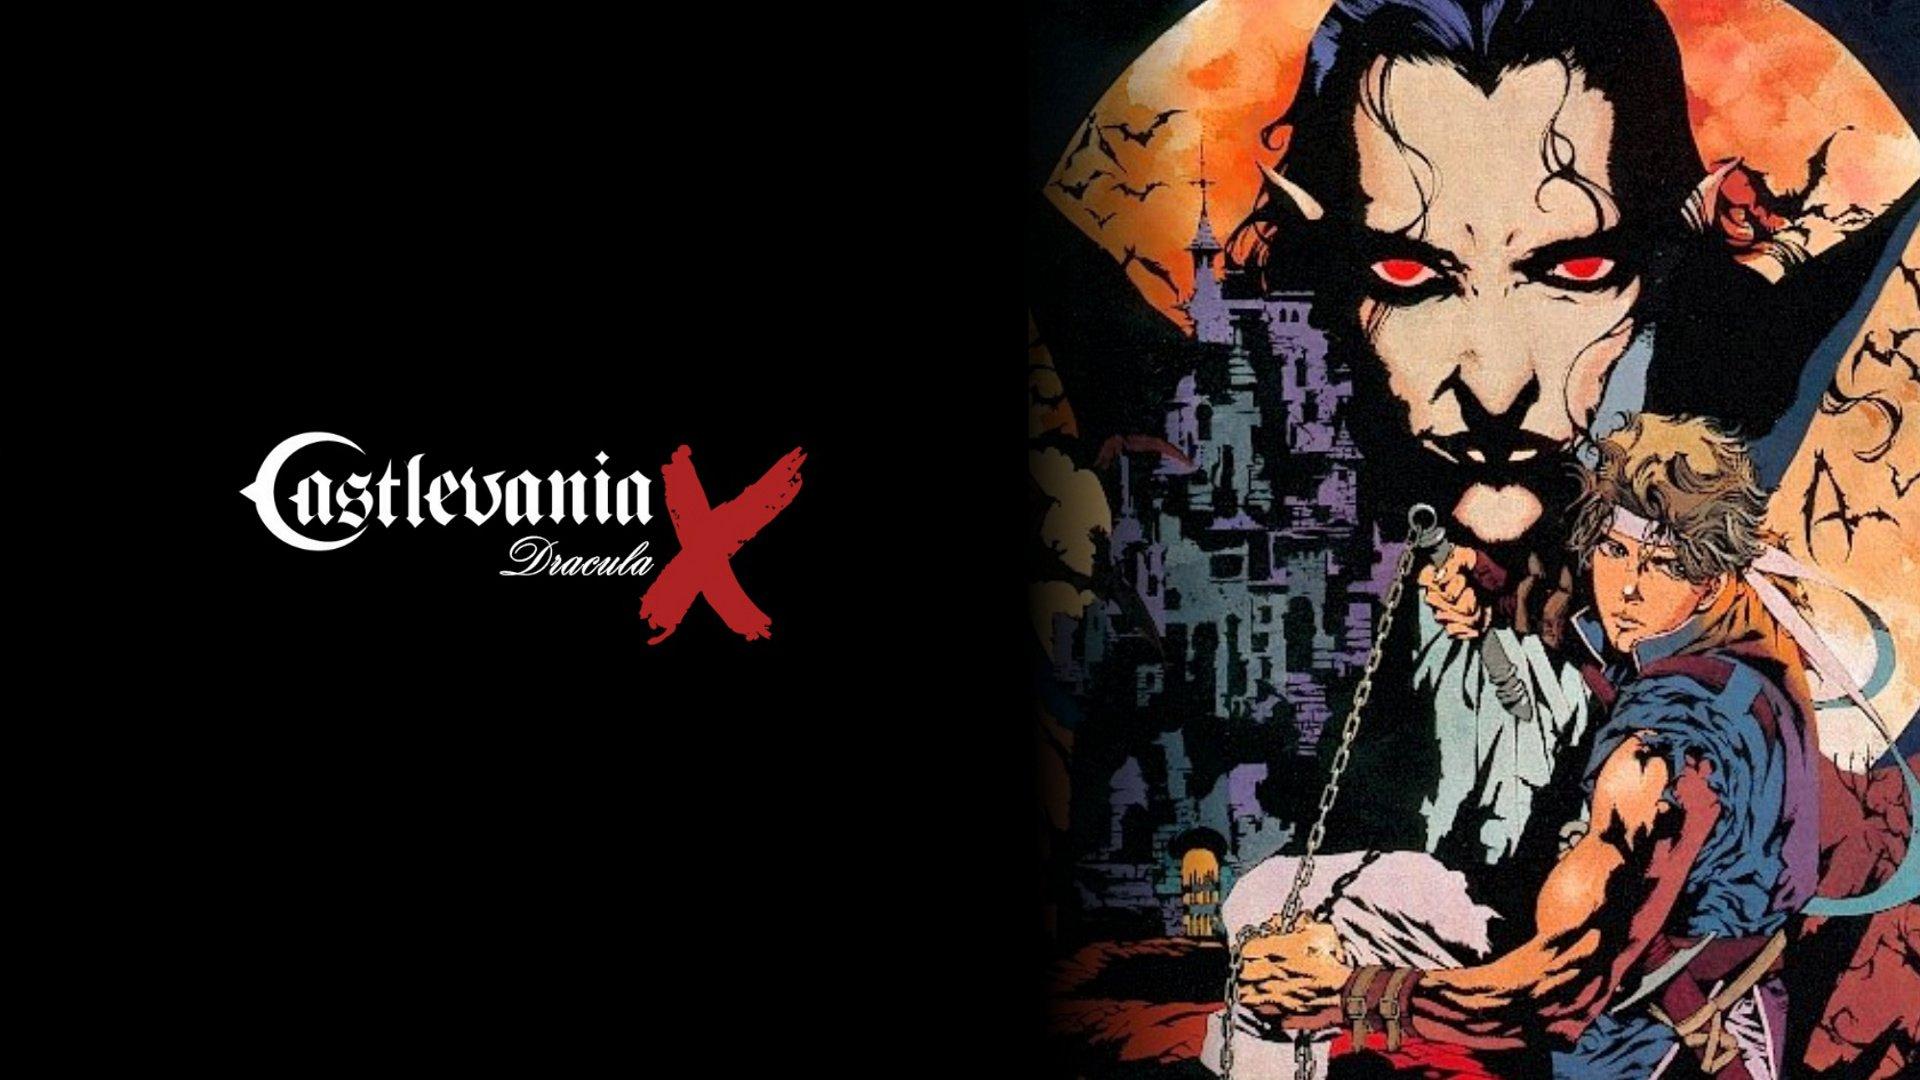 Castlevania Dracula X Hd Wallpaper Background Image 1920x1080